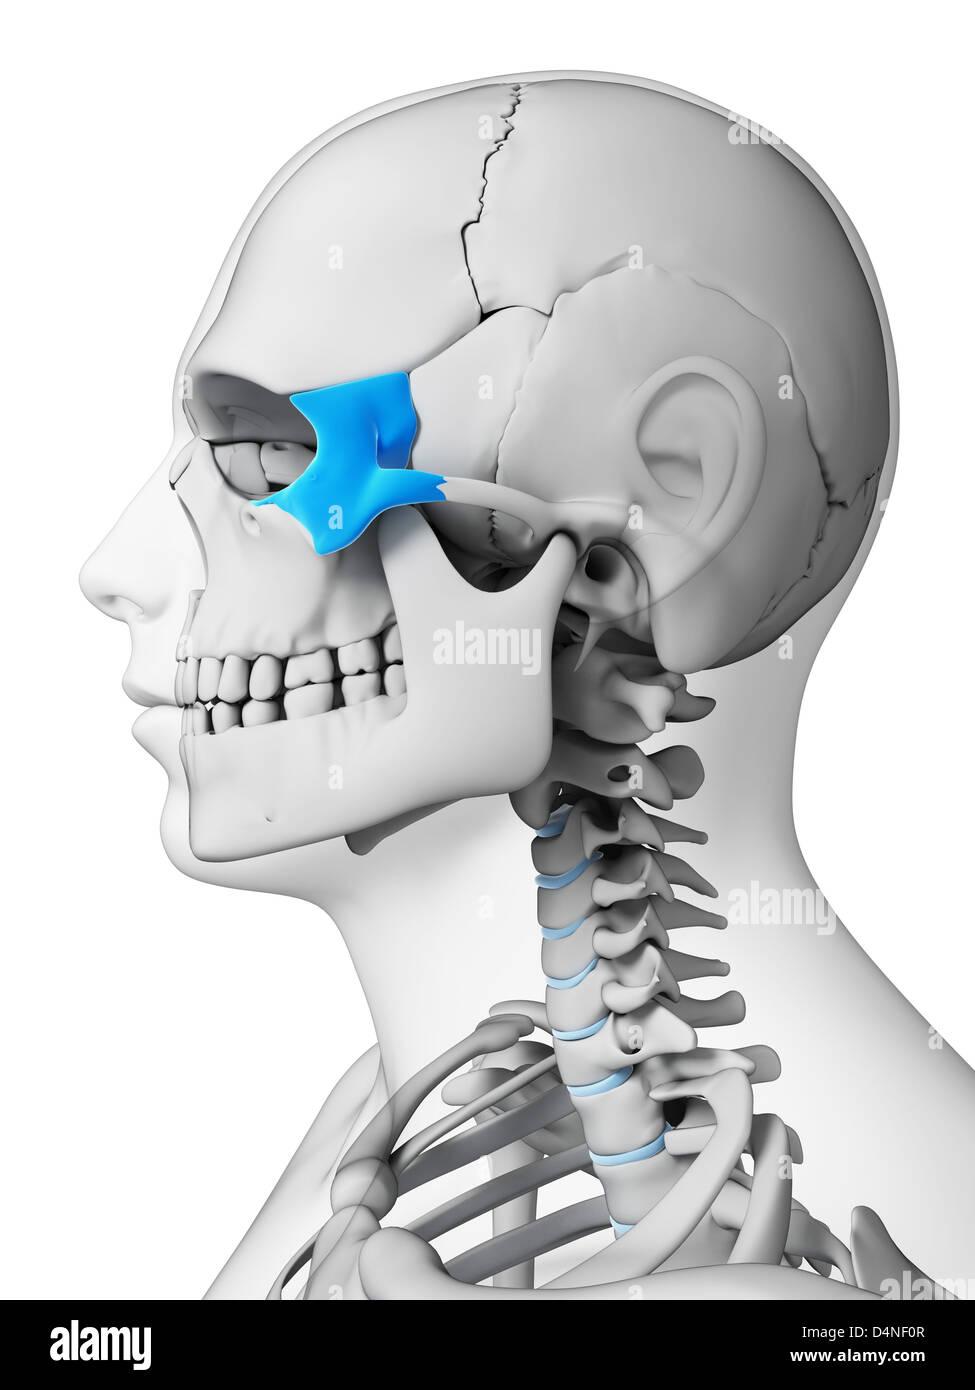 Zygomatic Knochen Stockfoto, Bild: 54562503 - Alamy